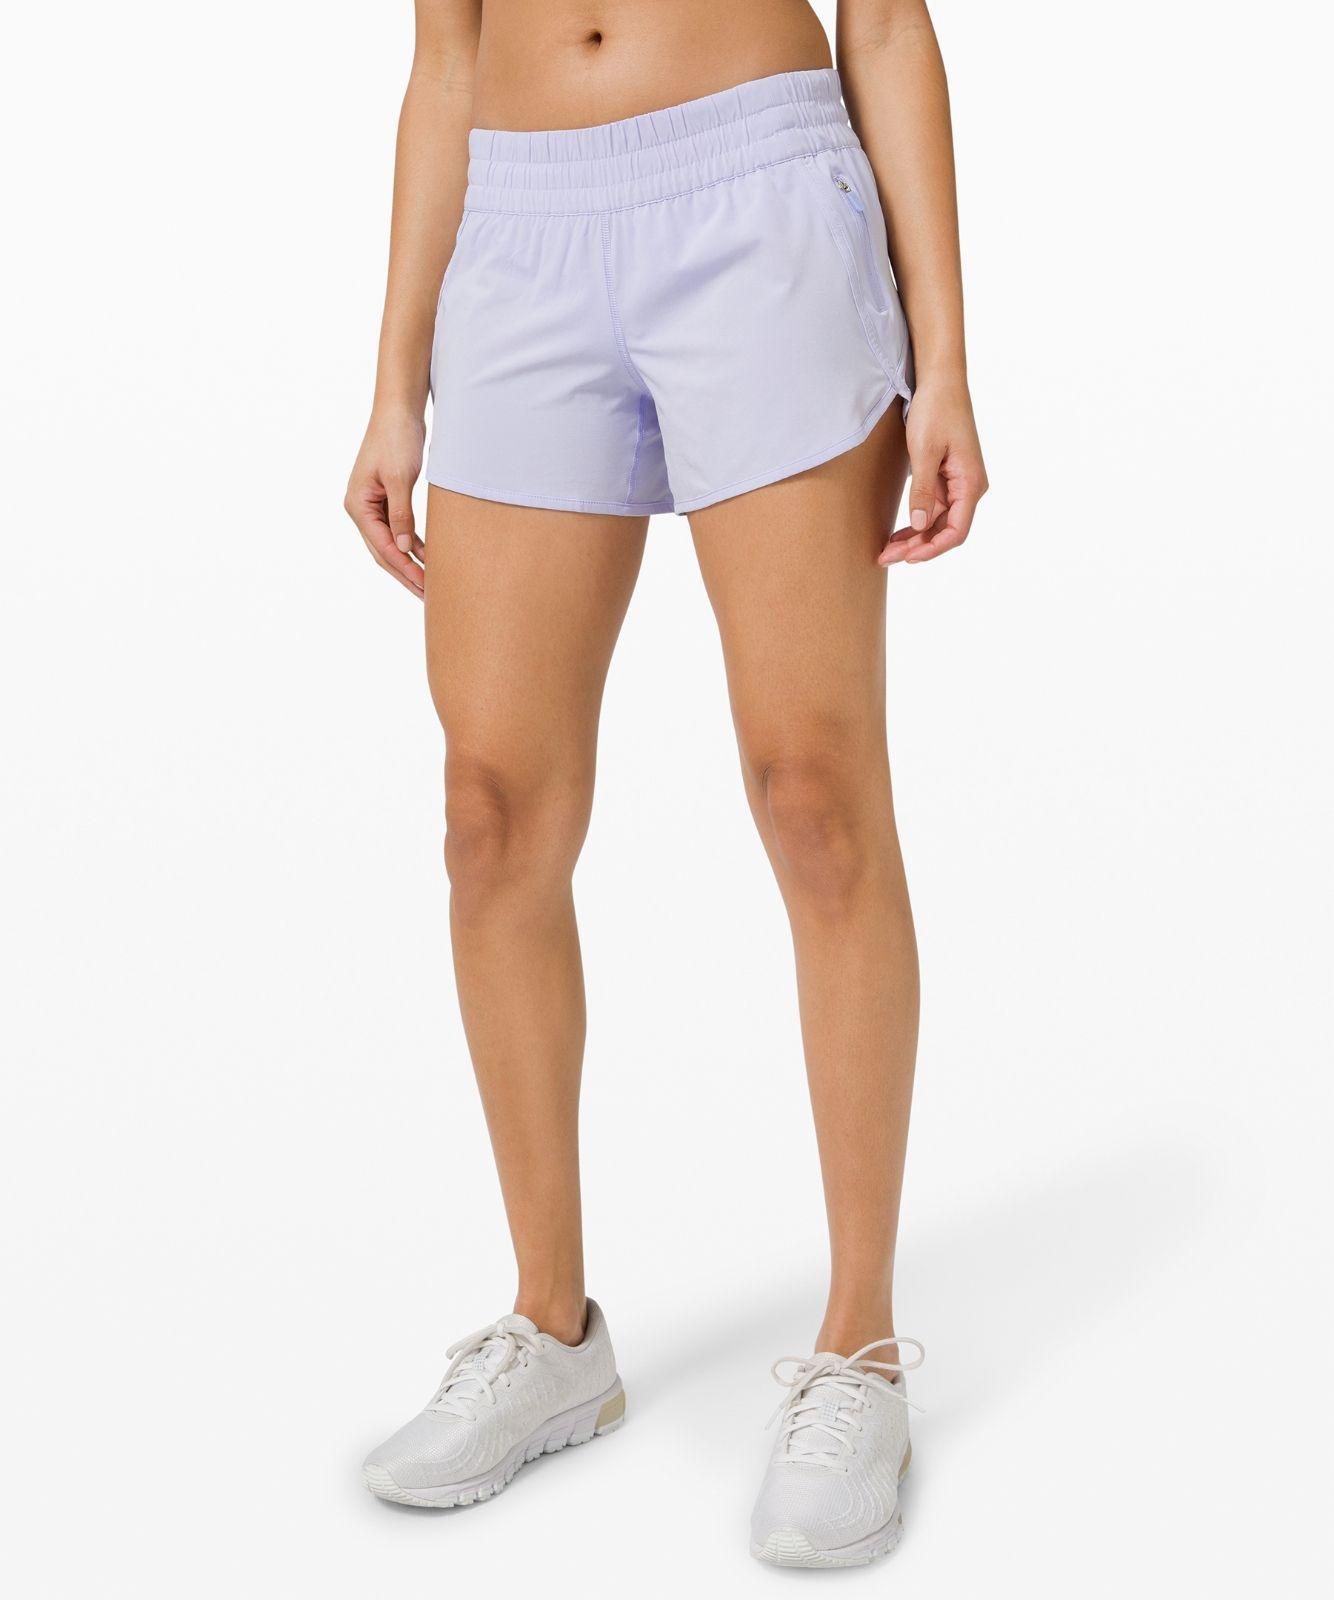 The best women's running shorts 2020